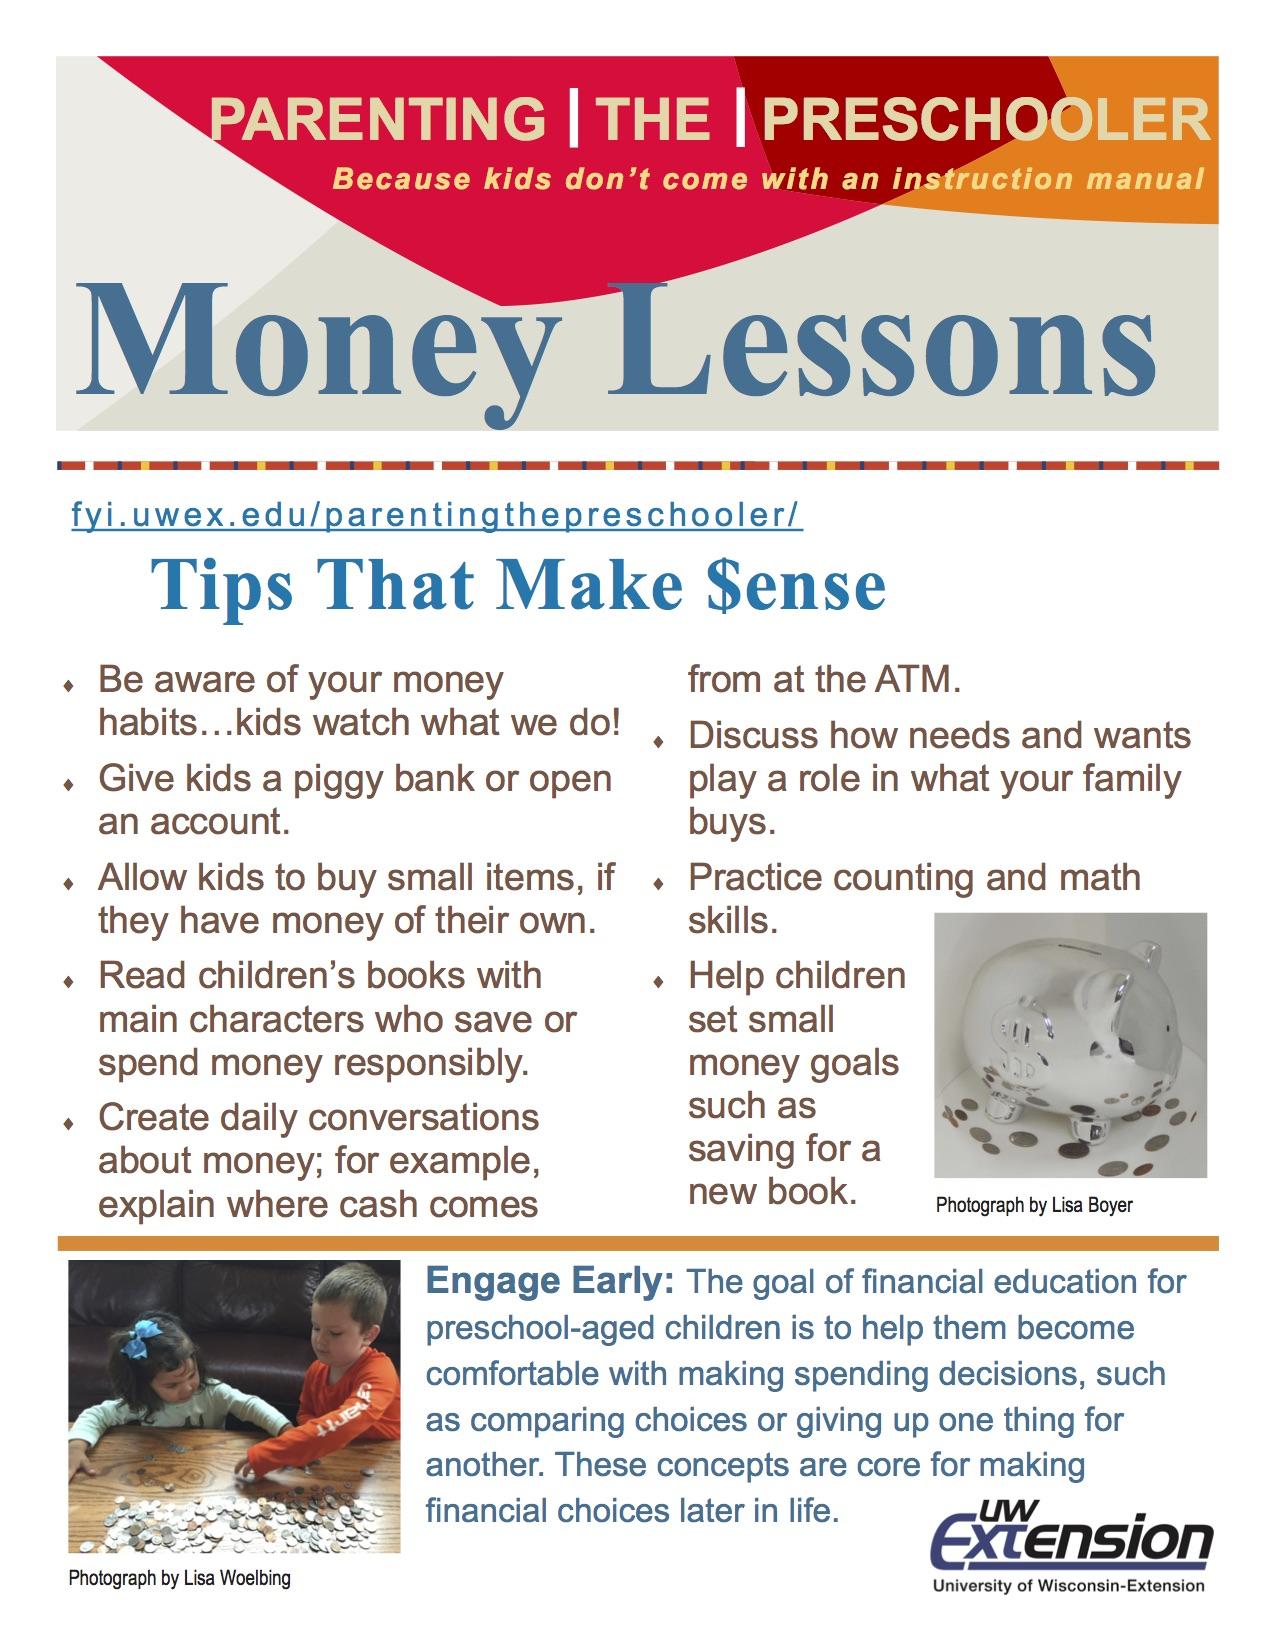 PtP-Money-Lessons